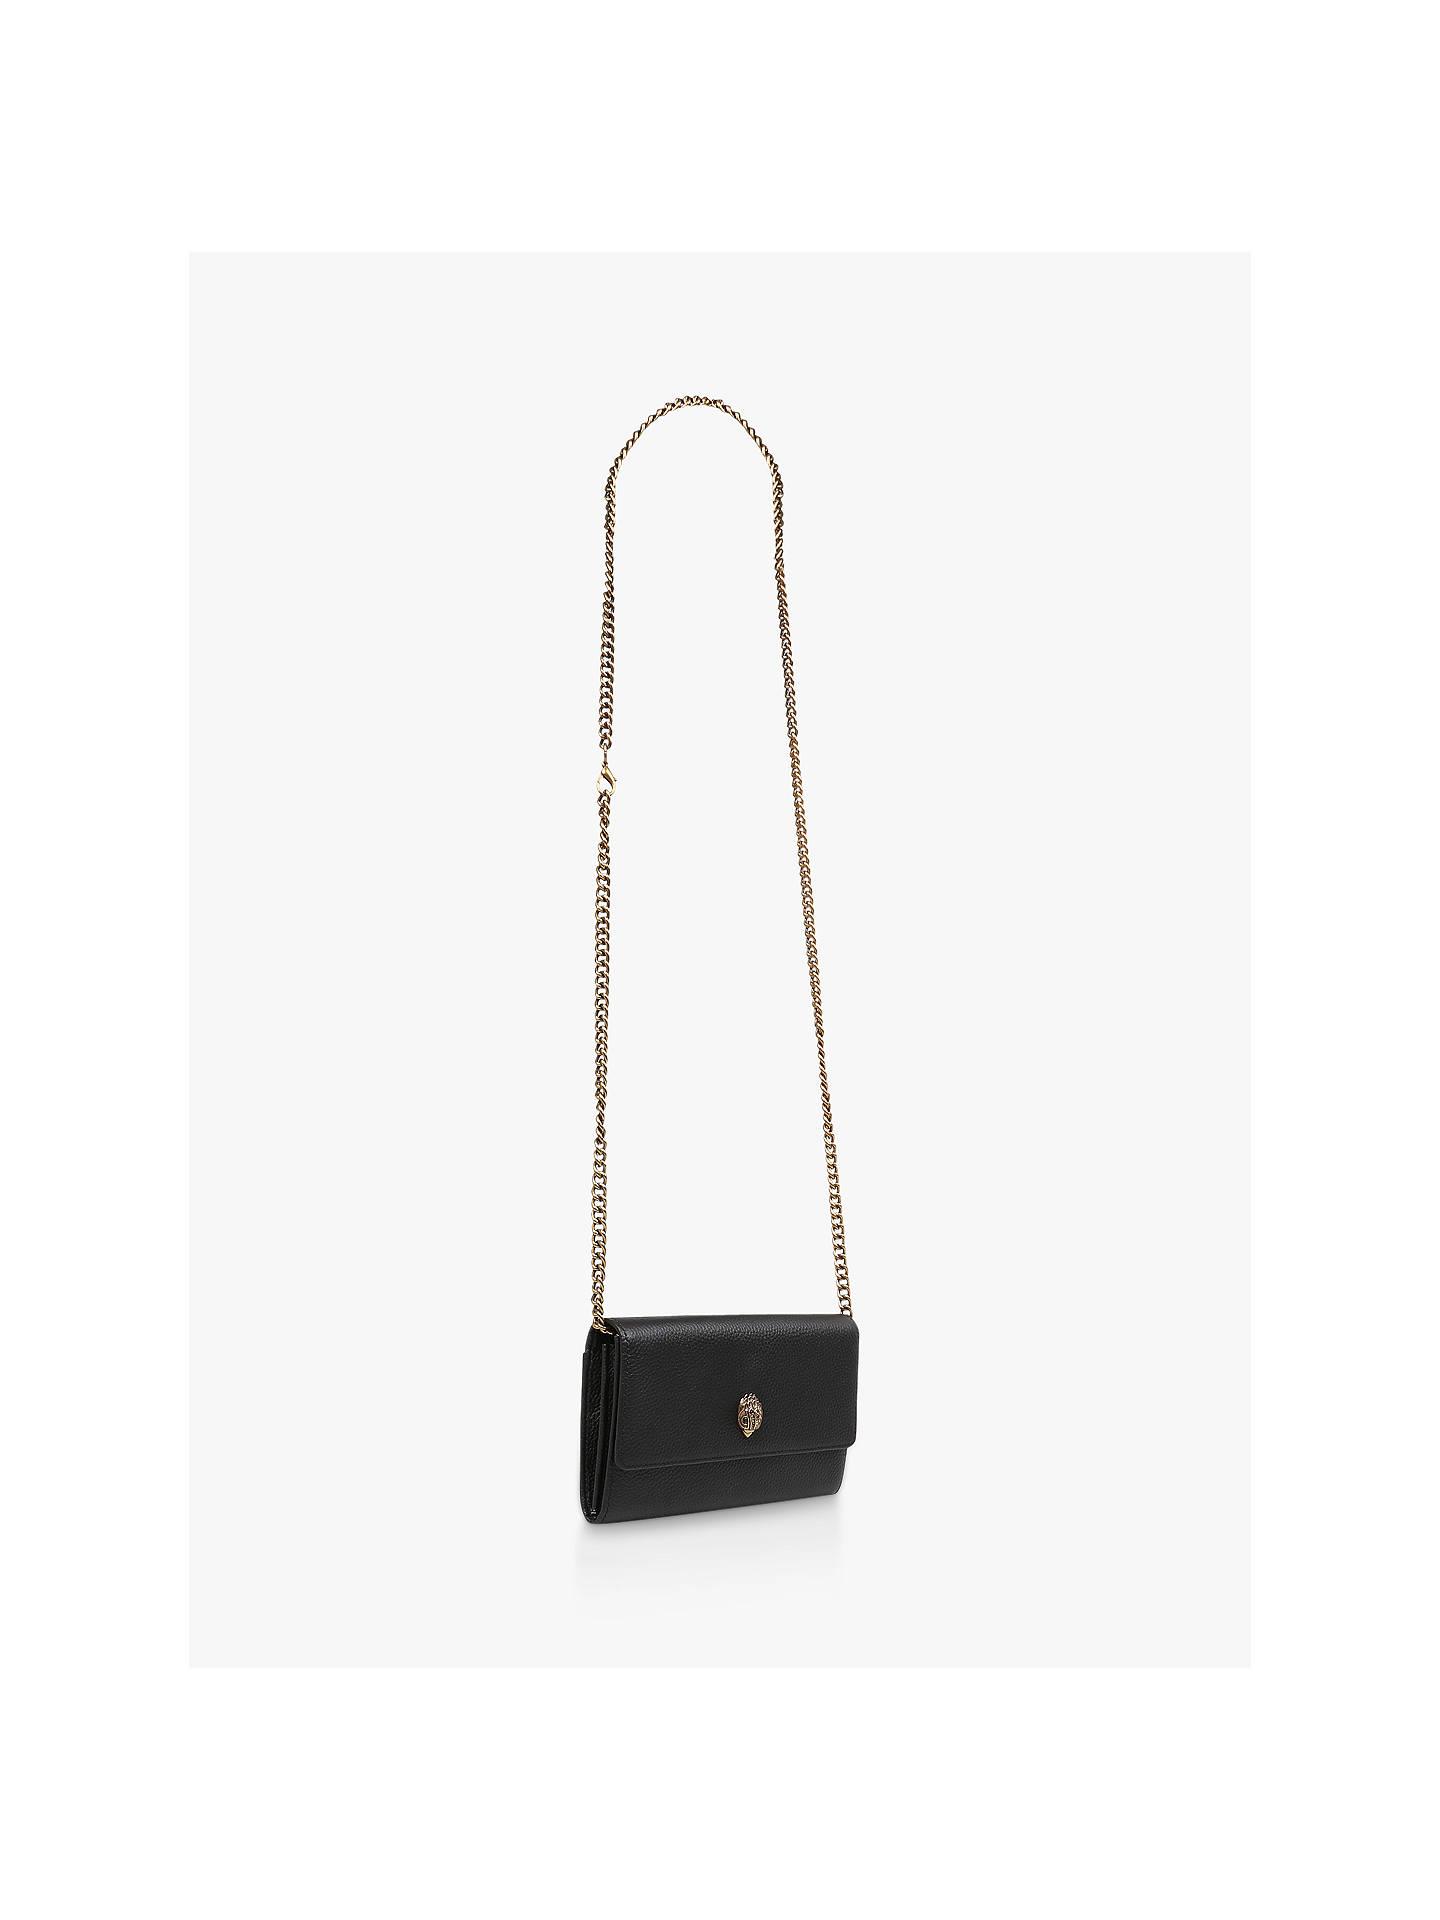 47eab69e0f9d Kurt Geiger London Kensington Leather Wallet Clutch Bag at John ...